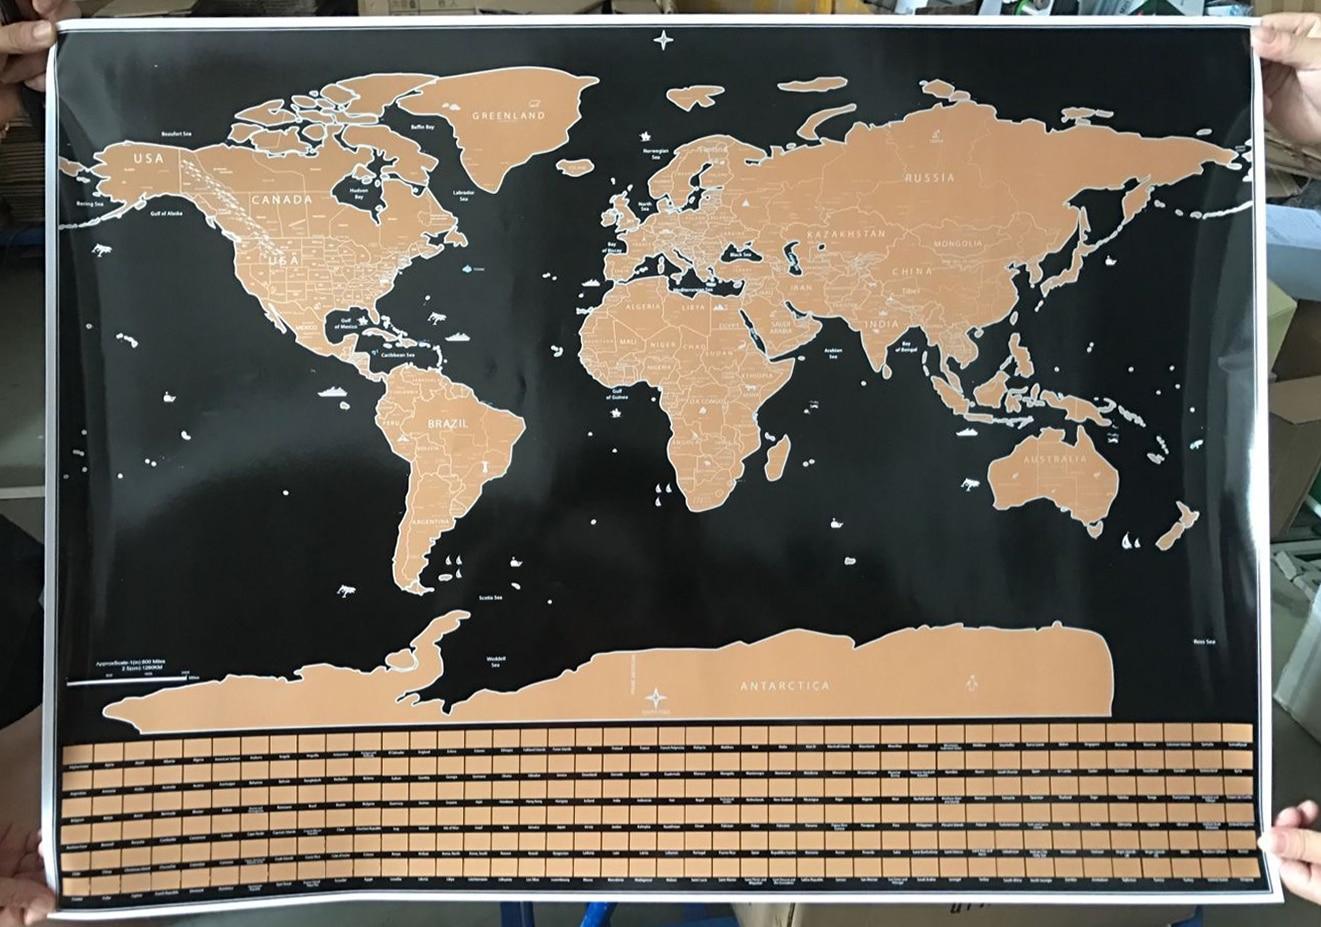 Travel edition scratchmap parent map deluxe scratch edition world map travel world poster map oceans diy gumiabroncs Images